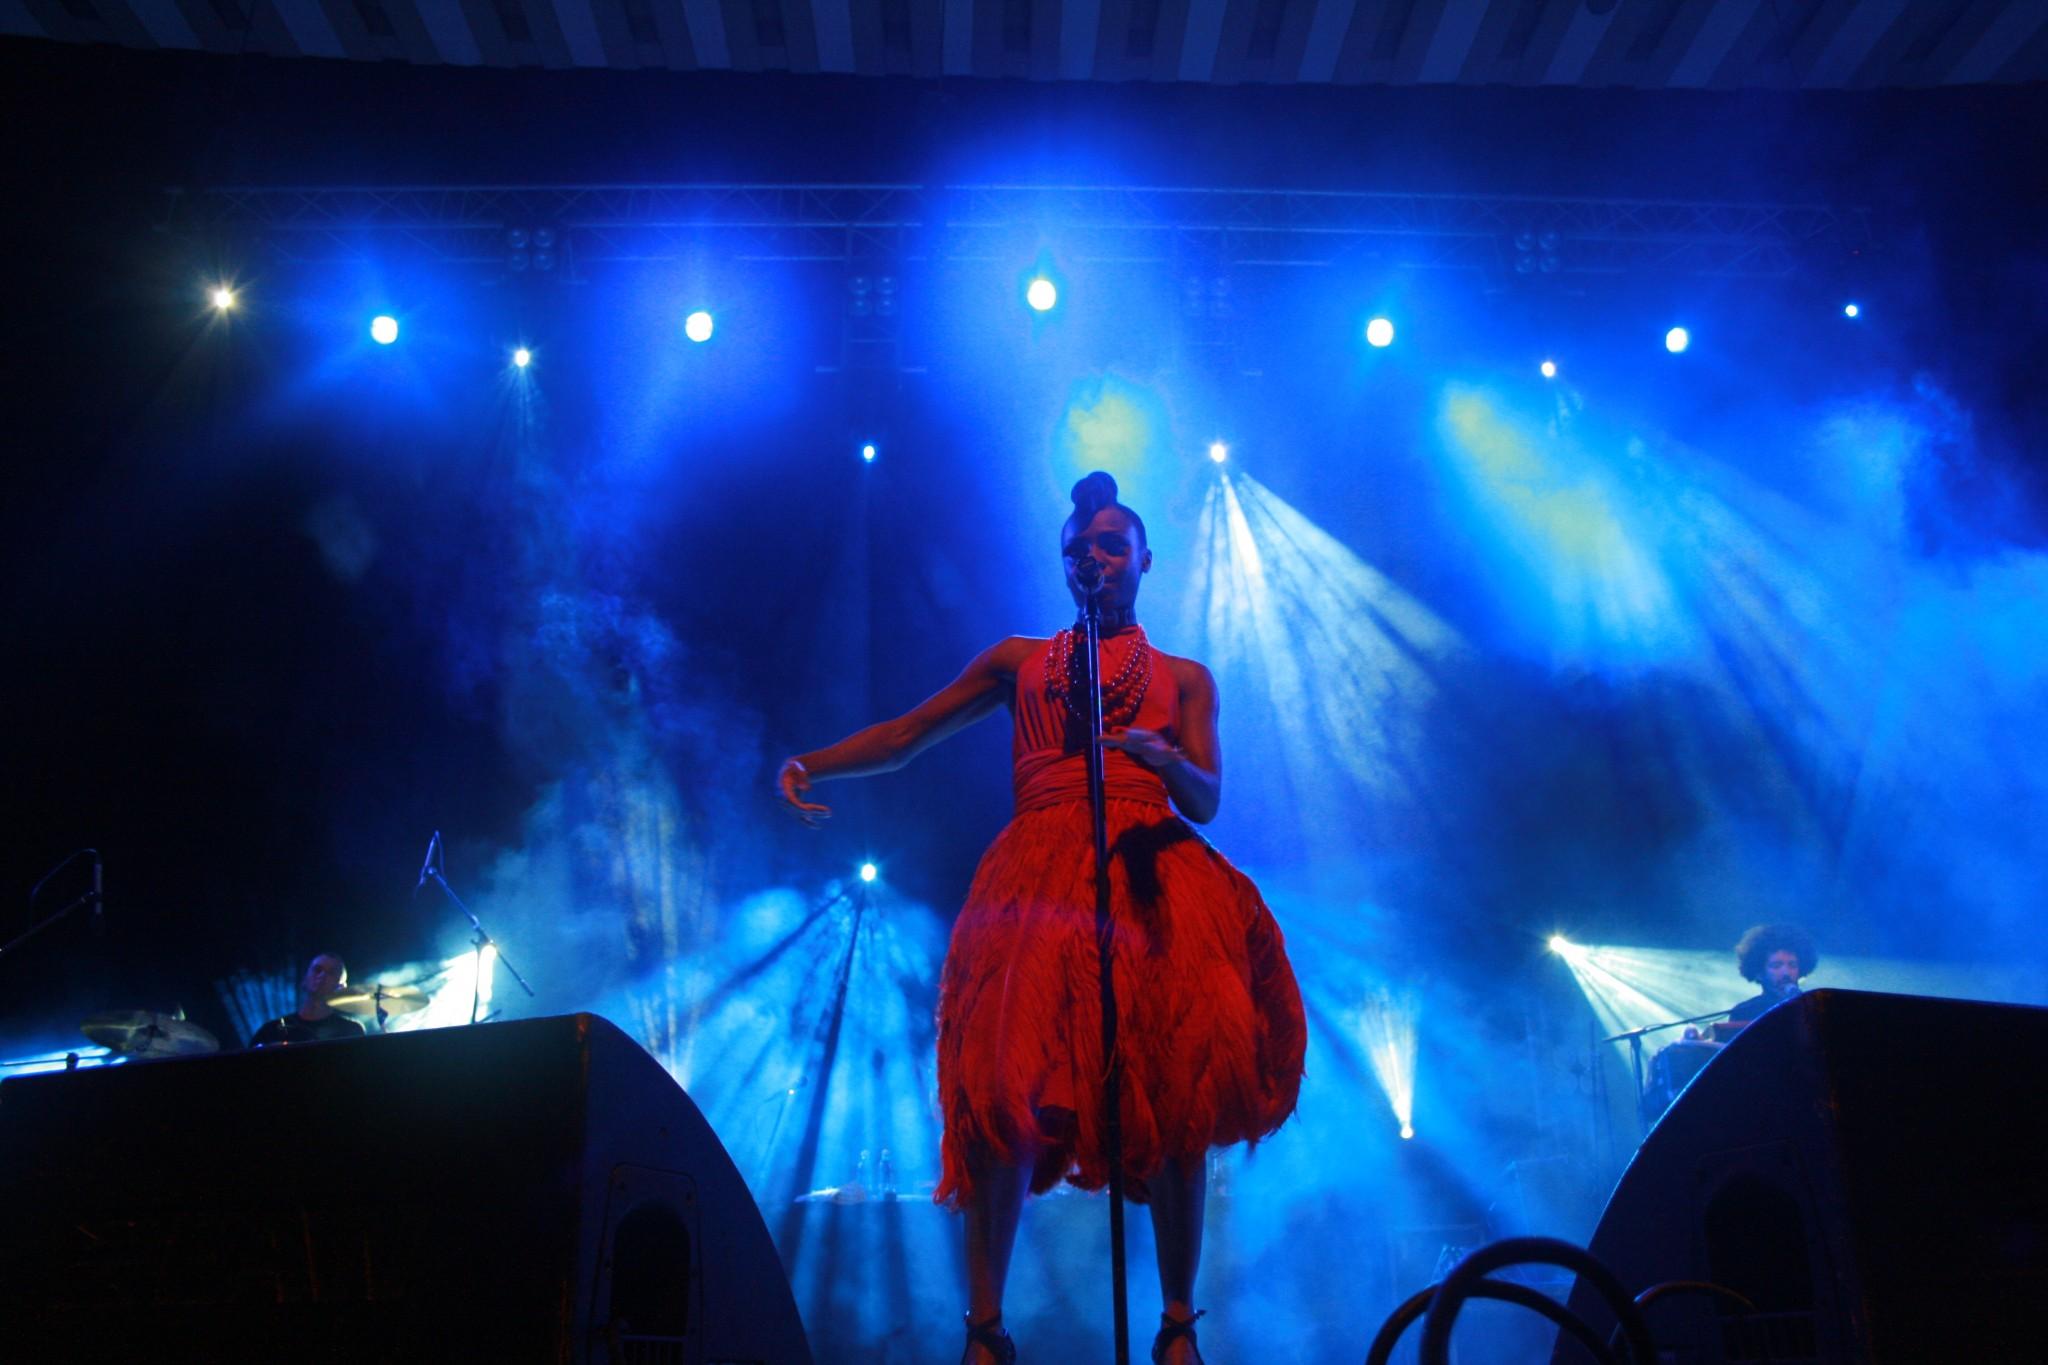 http://localhost/cosmo/wp-content/uploads/2012/04/10/morcheeba-concert-bucuresti.JPG